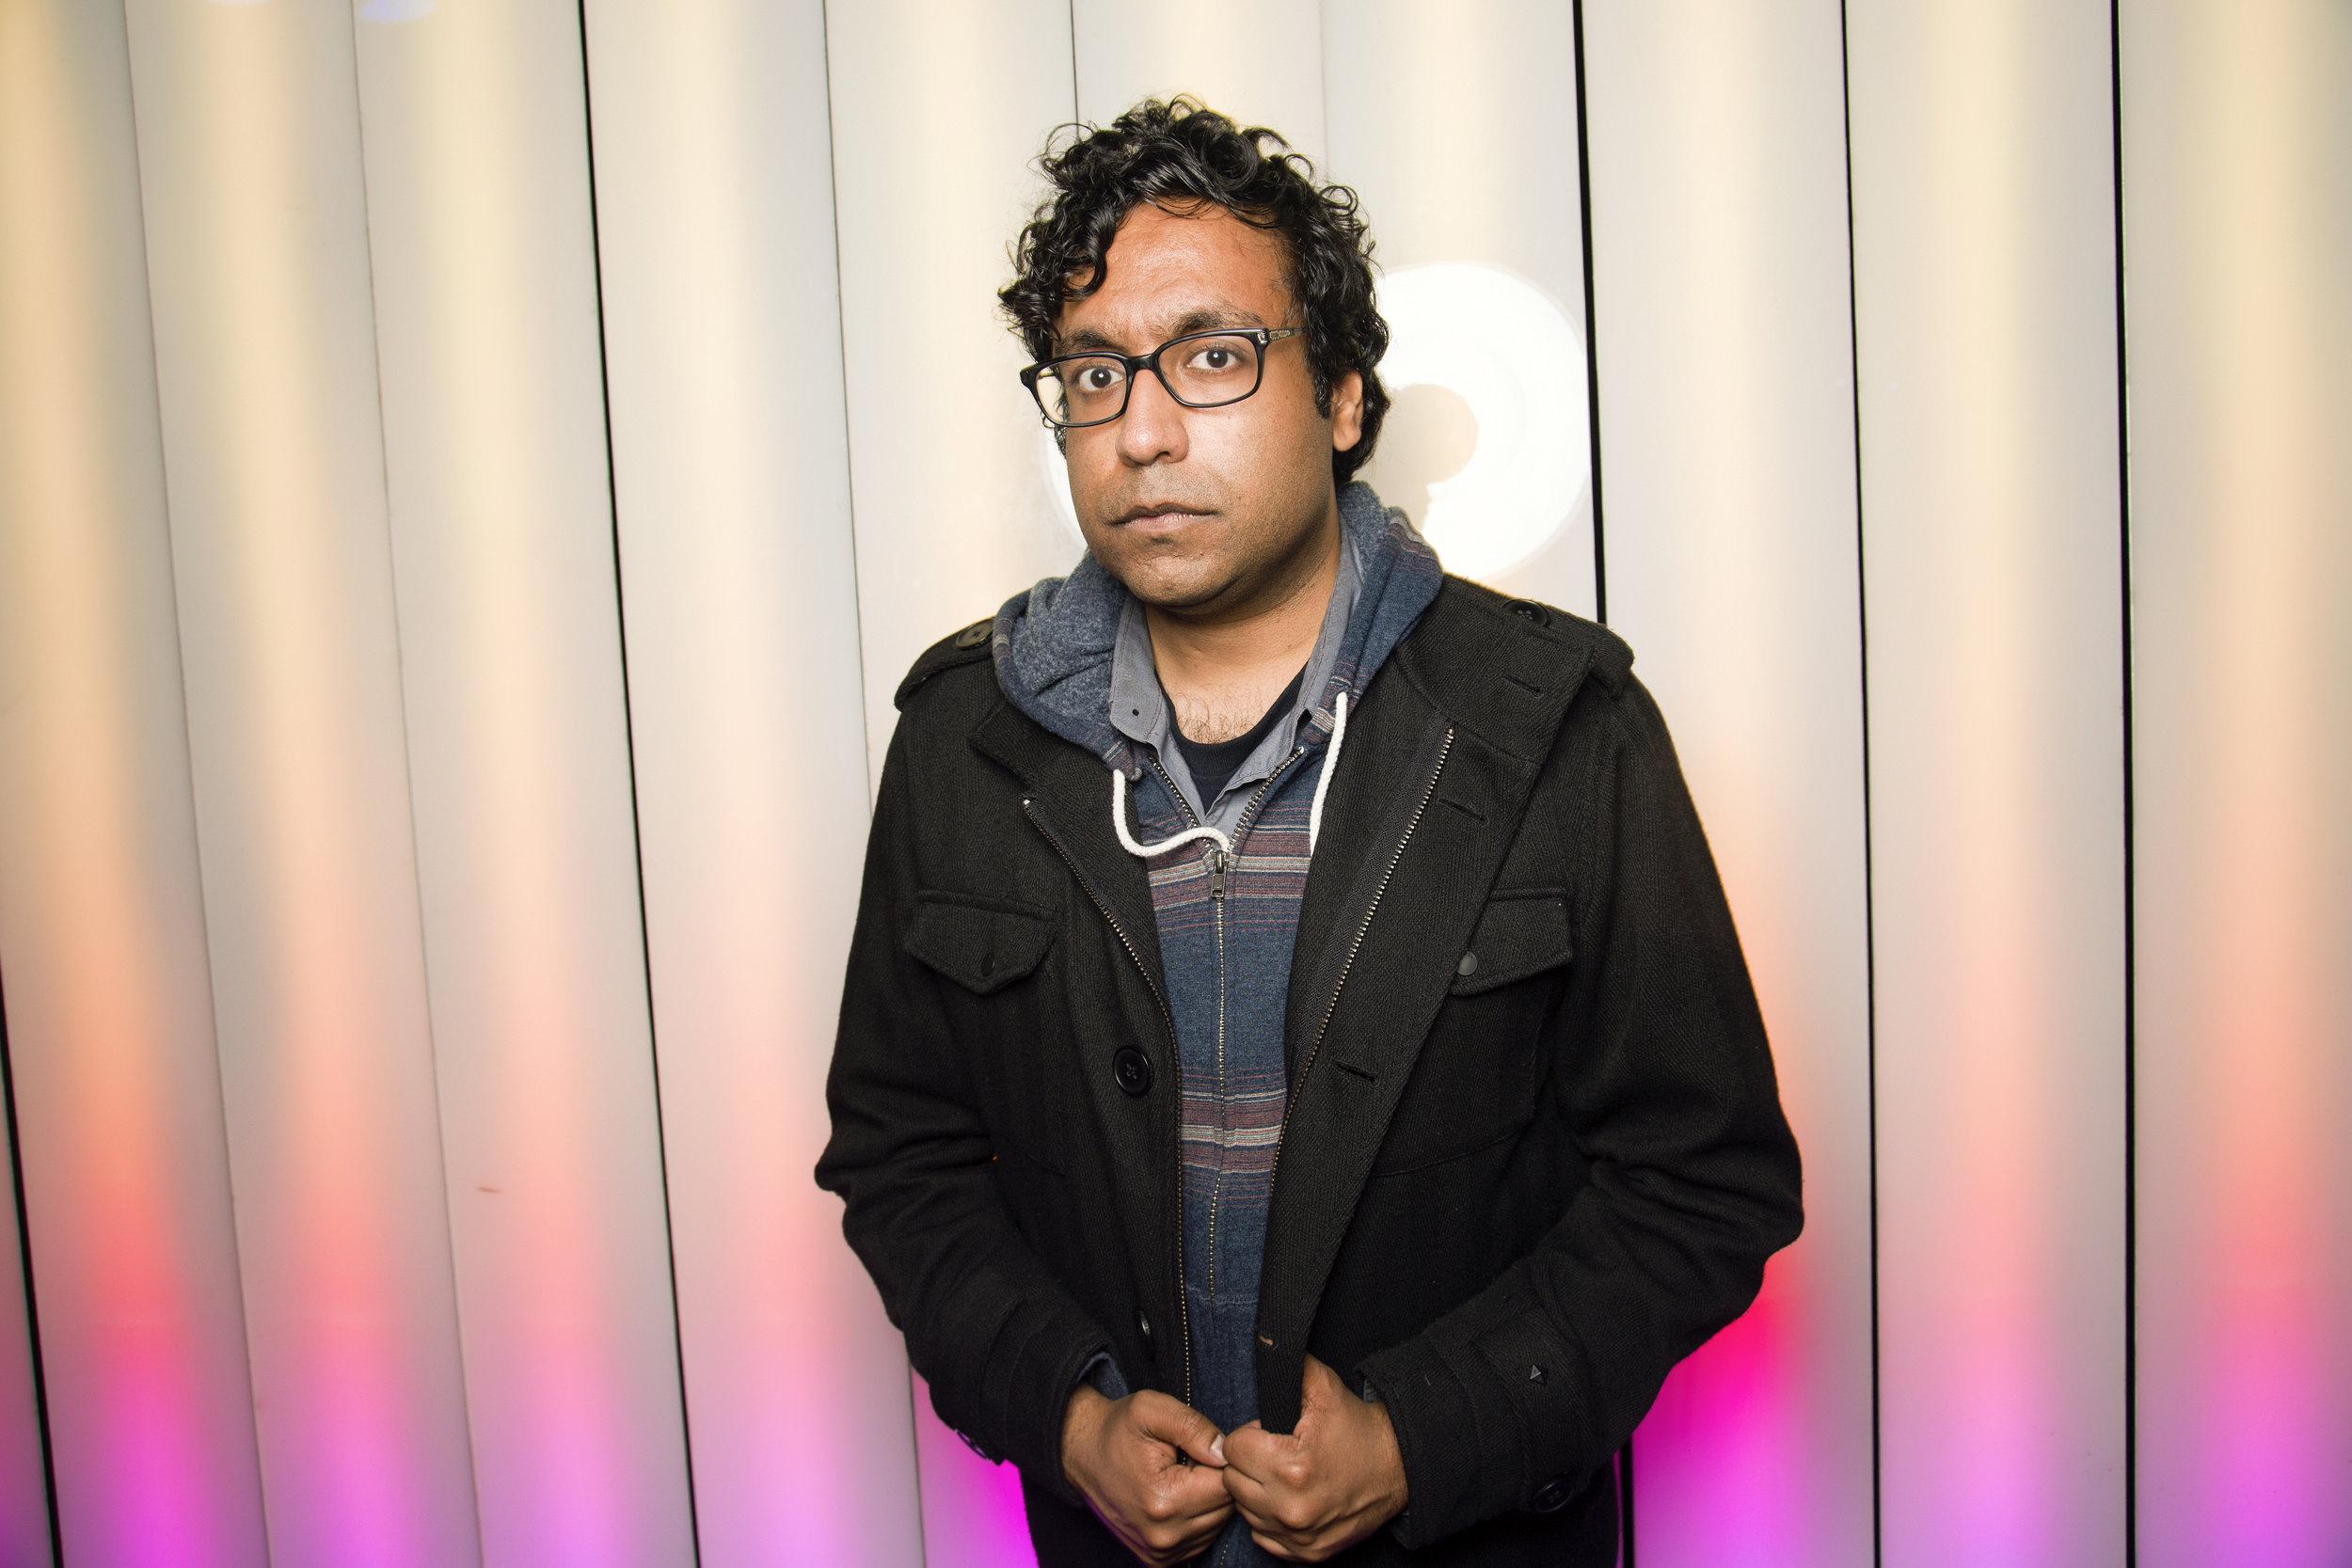 Hari Kondabolu is among the artists on showcase at the Indian Summer Festival.